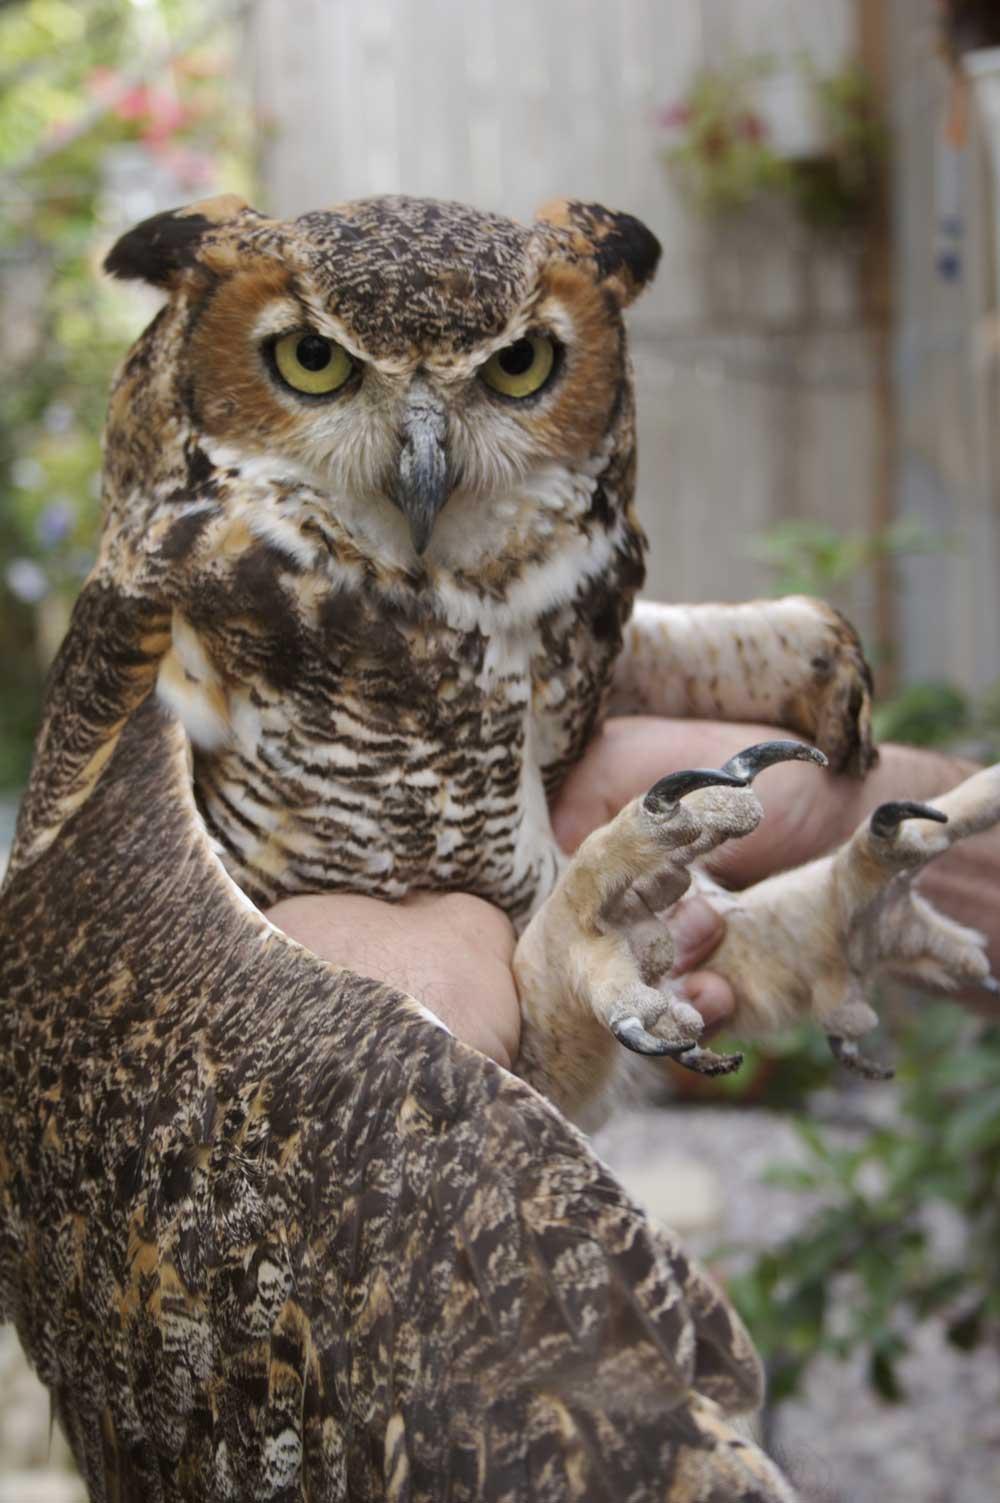 Bird Sanctuaries Fill a Need in Florida